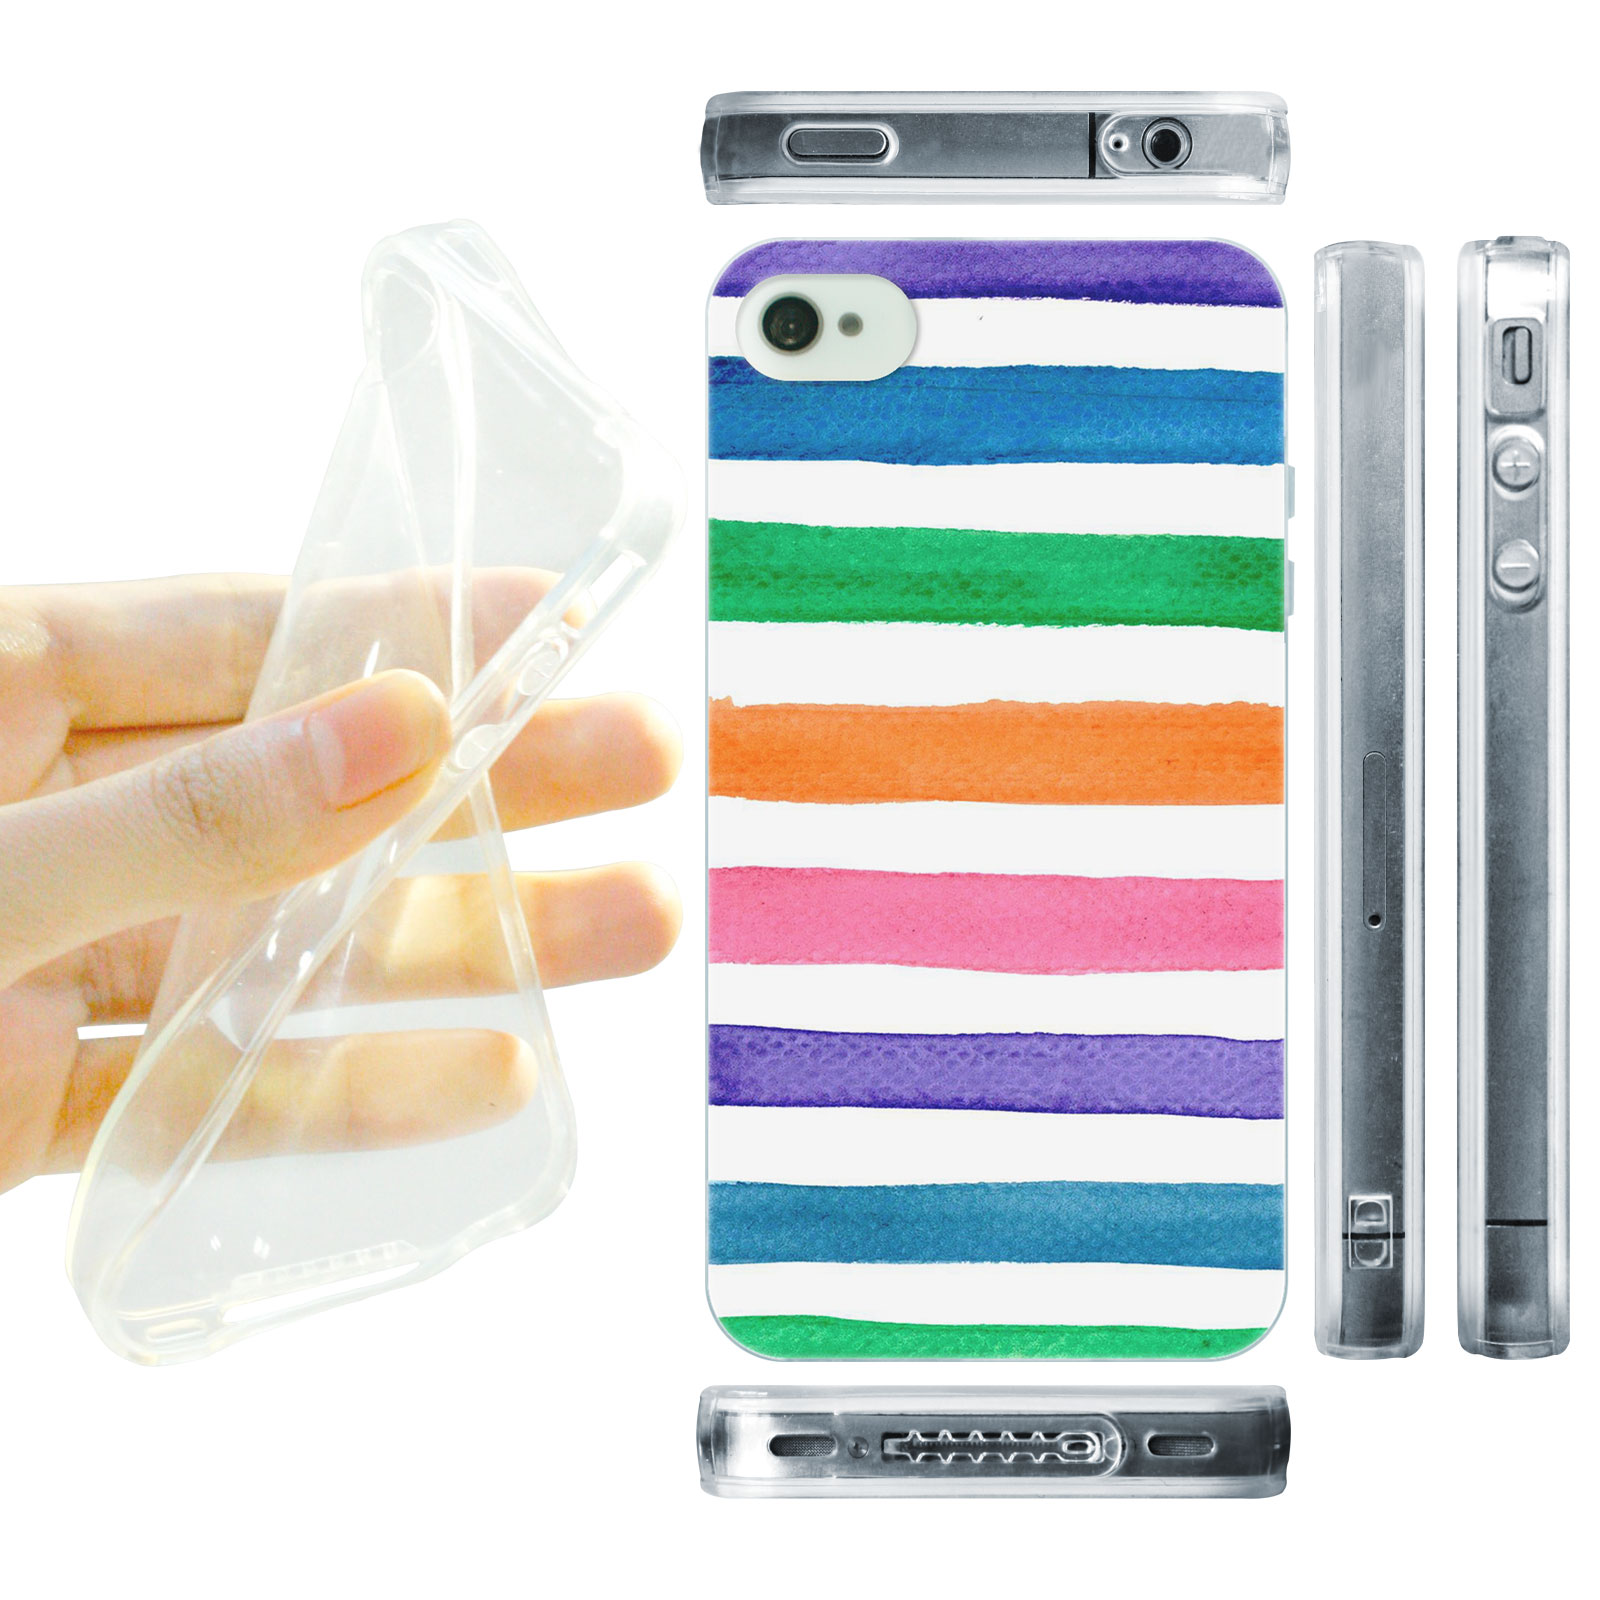 HEAD CASE silikonový obal na mobil Iphone 4/4S Vzor barevné pruhy barevná kombinace duha